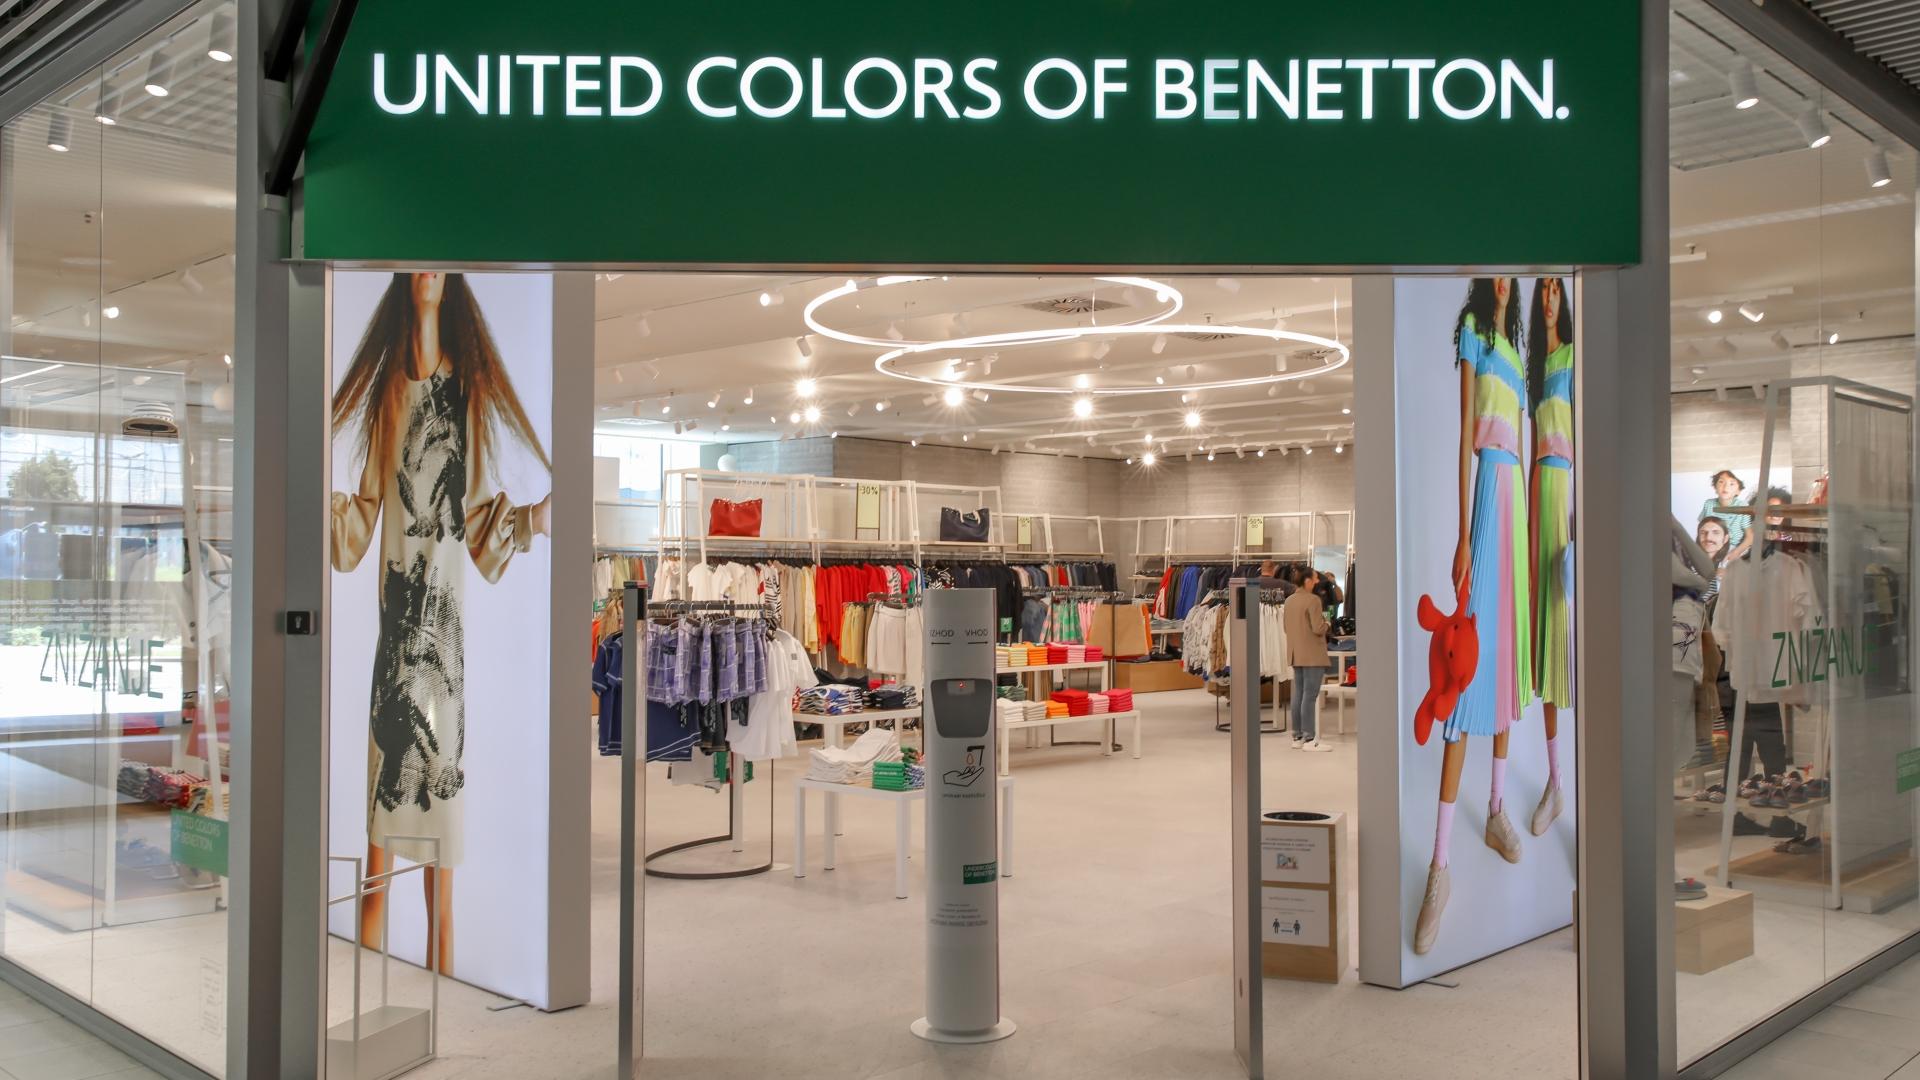 United-Colors-of-Benetton-hero